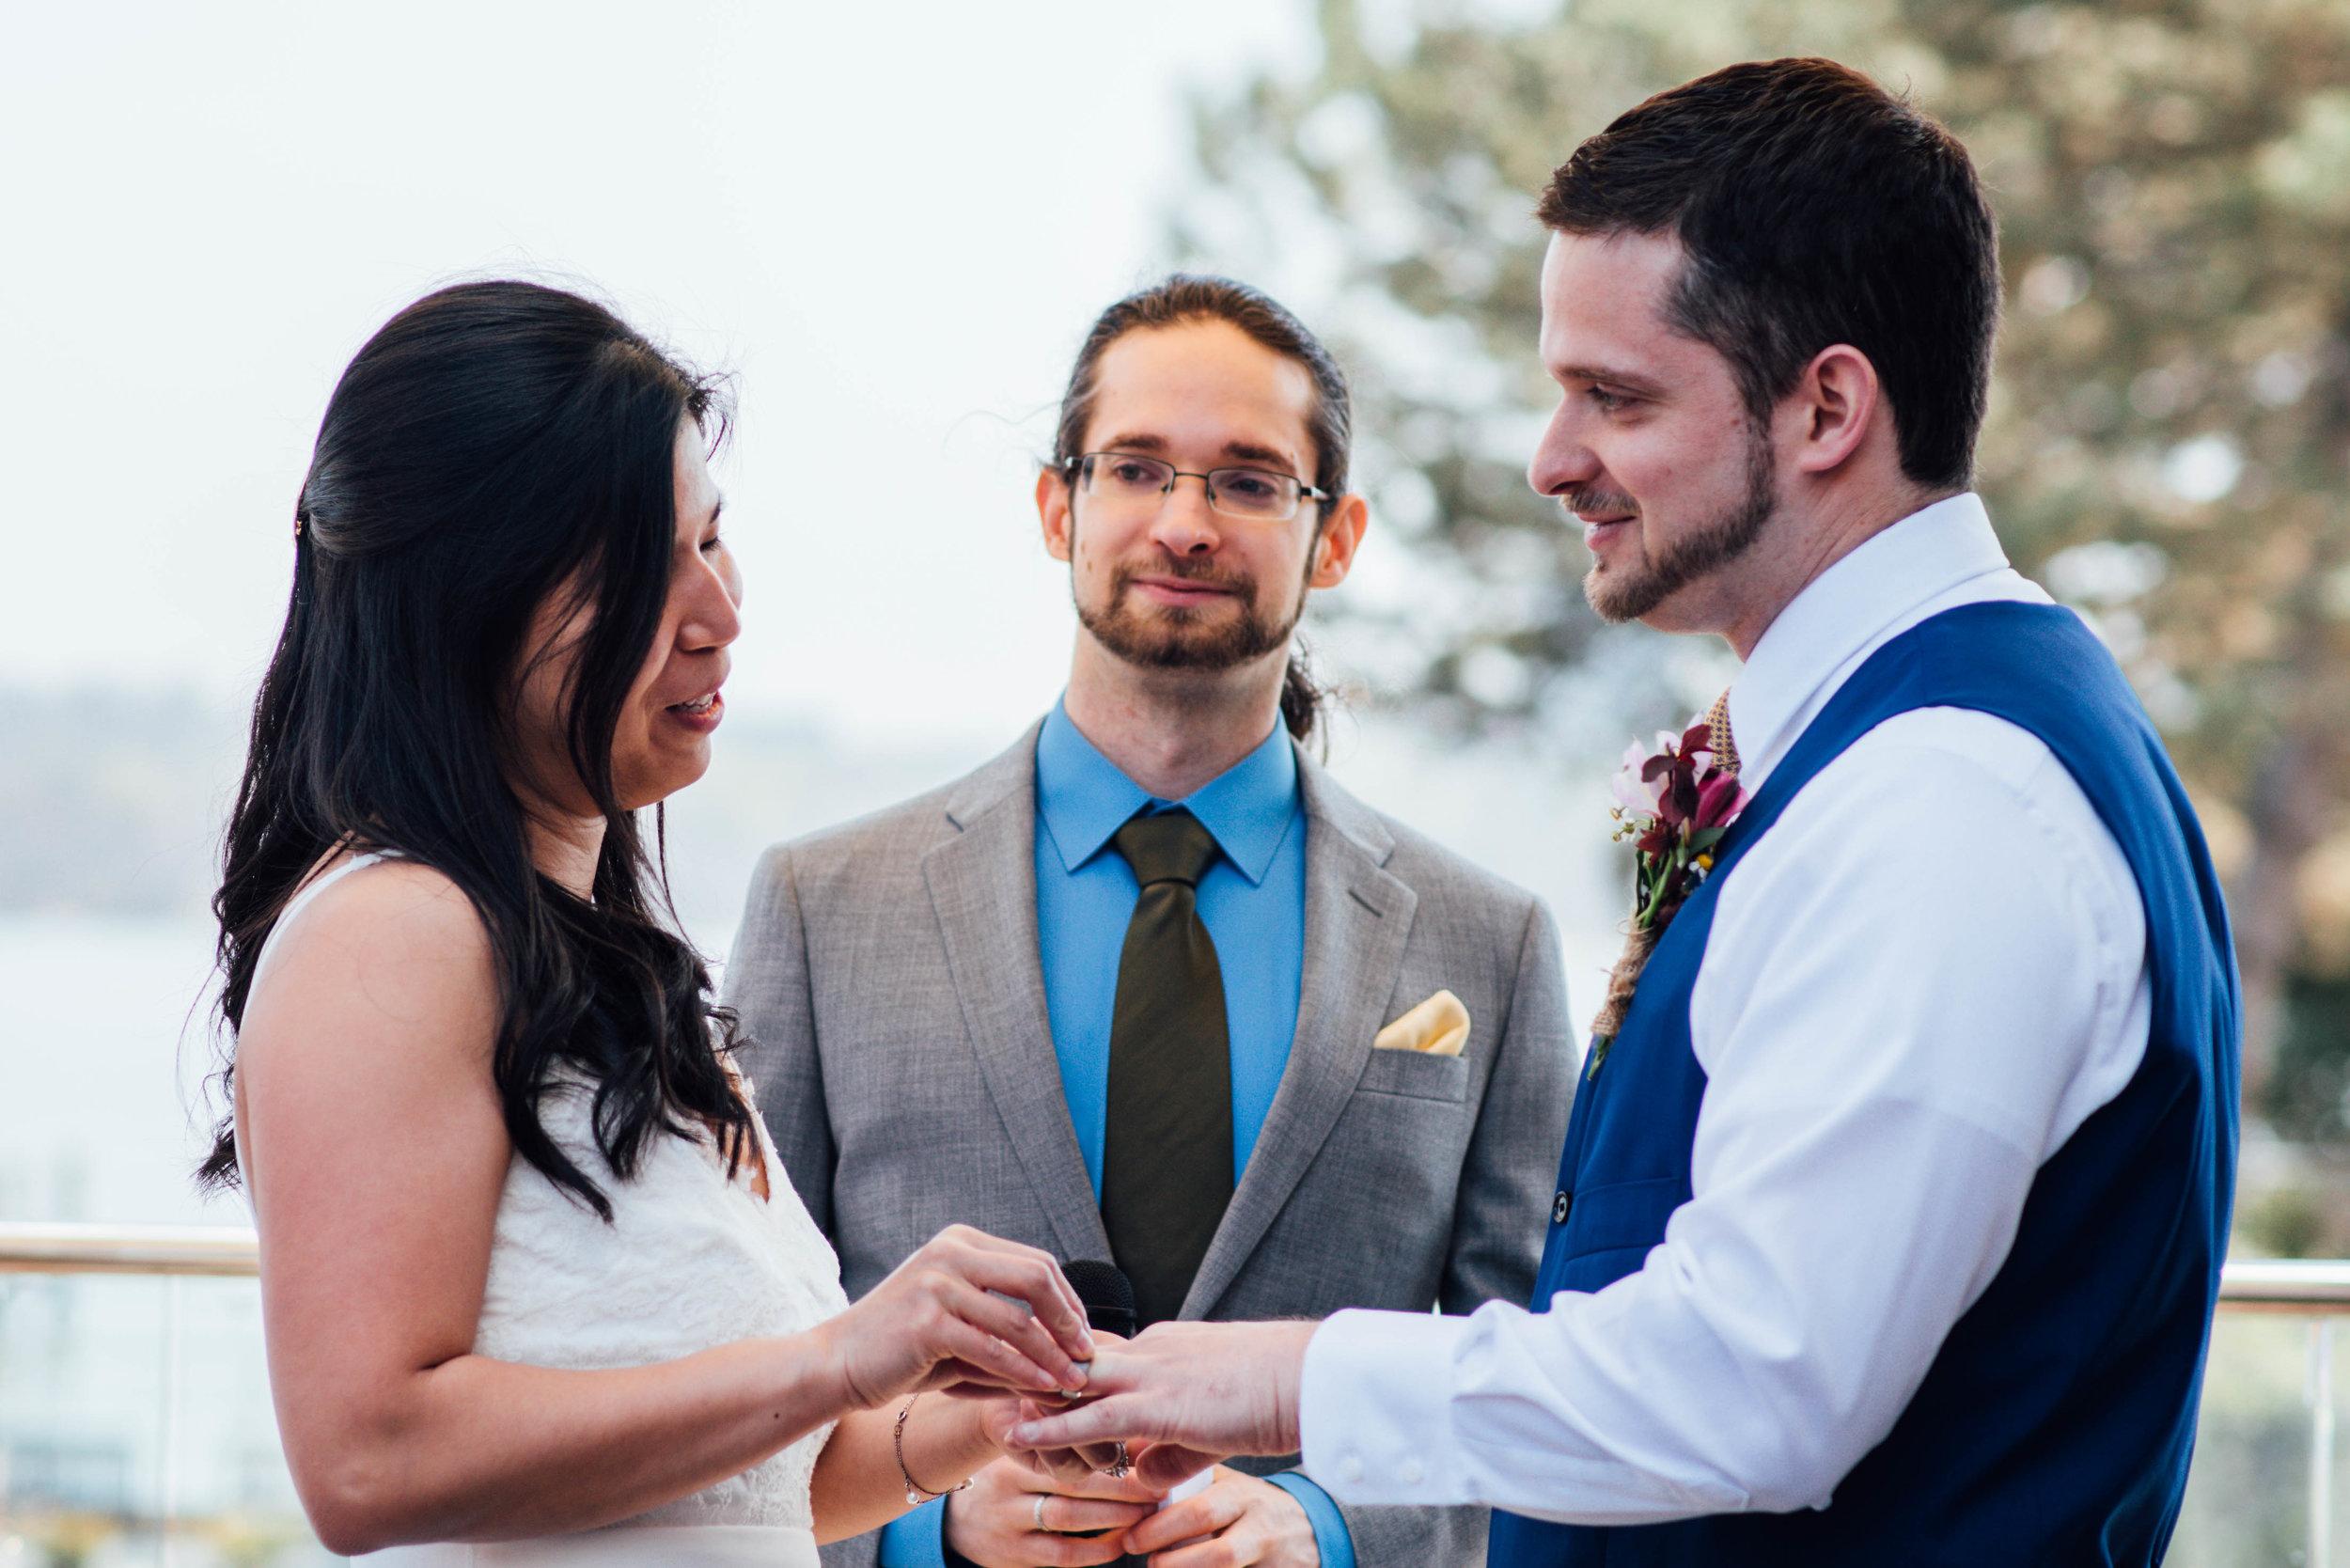 Multicultural Jewish Wedding Vows in Alexandria, VA